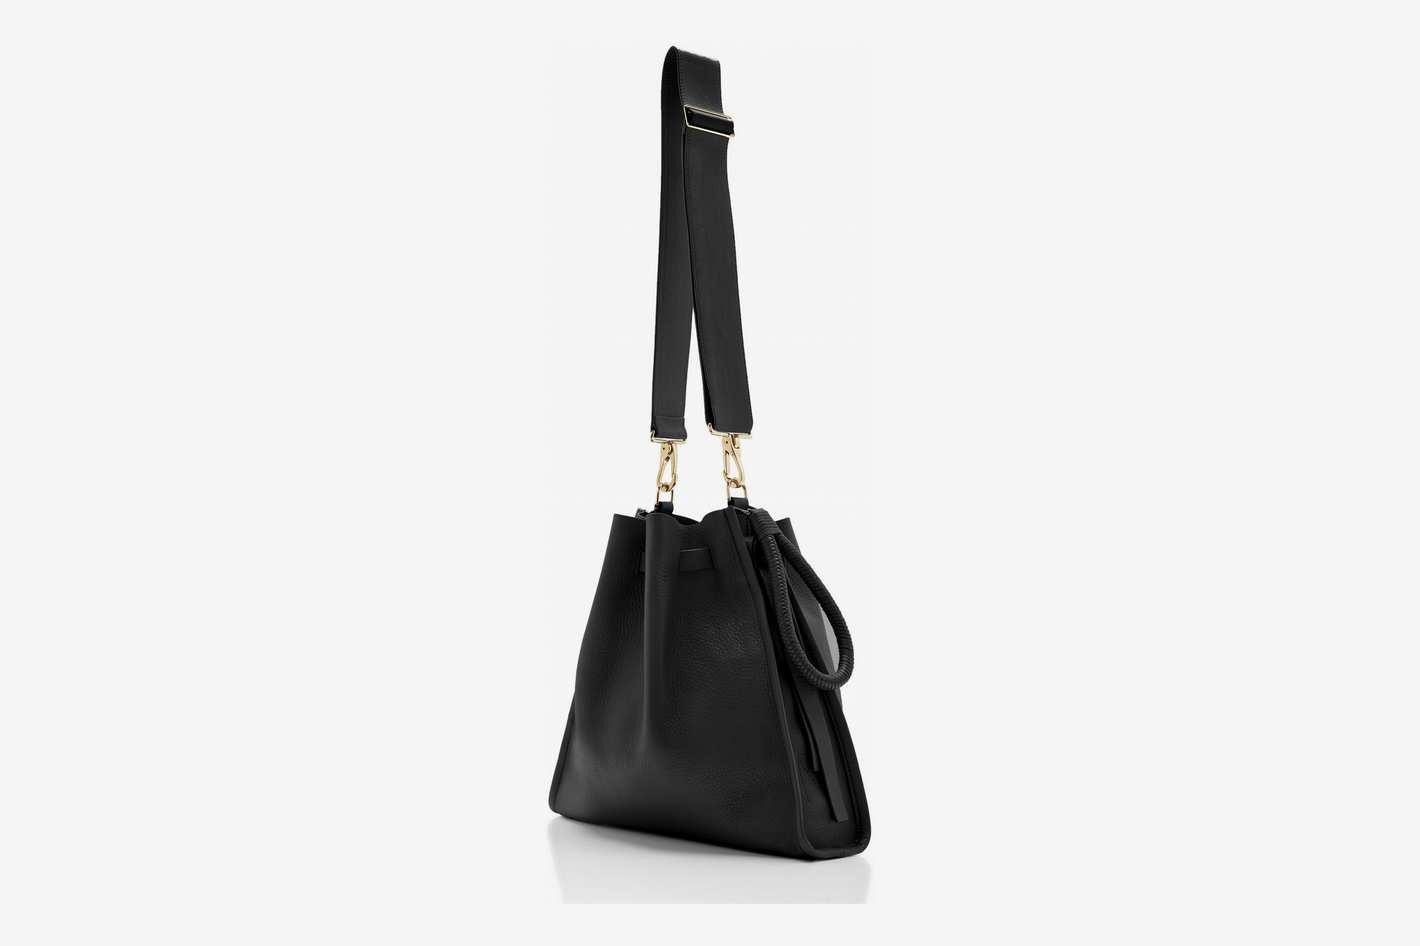 Tamara Mellon Kiss Bag